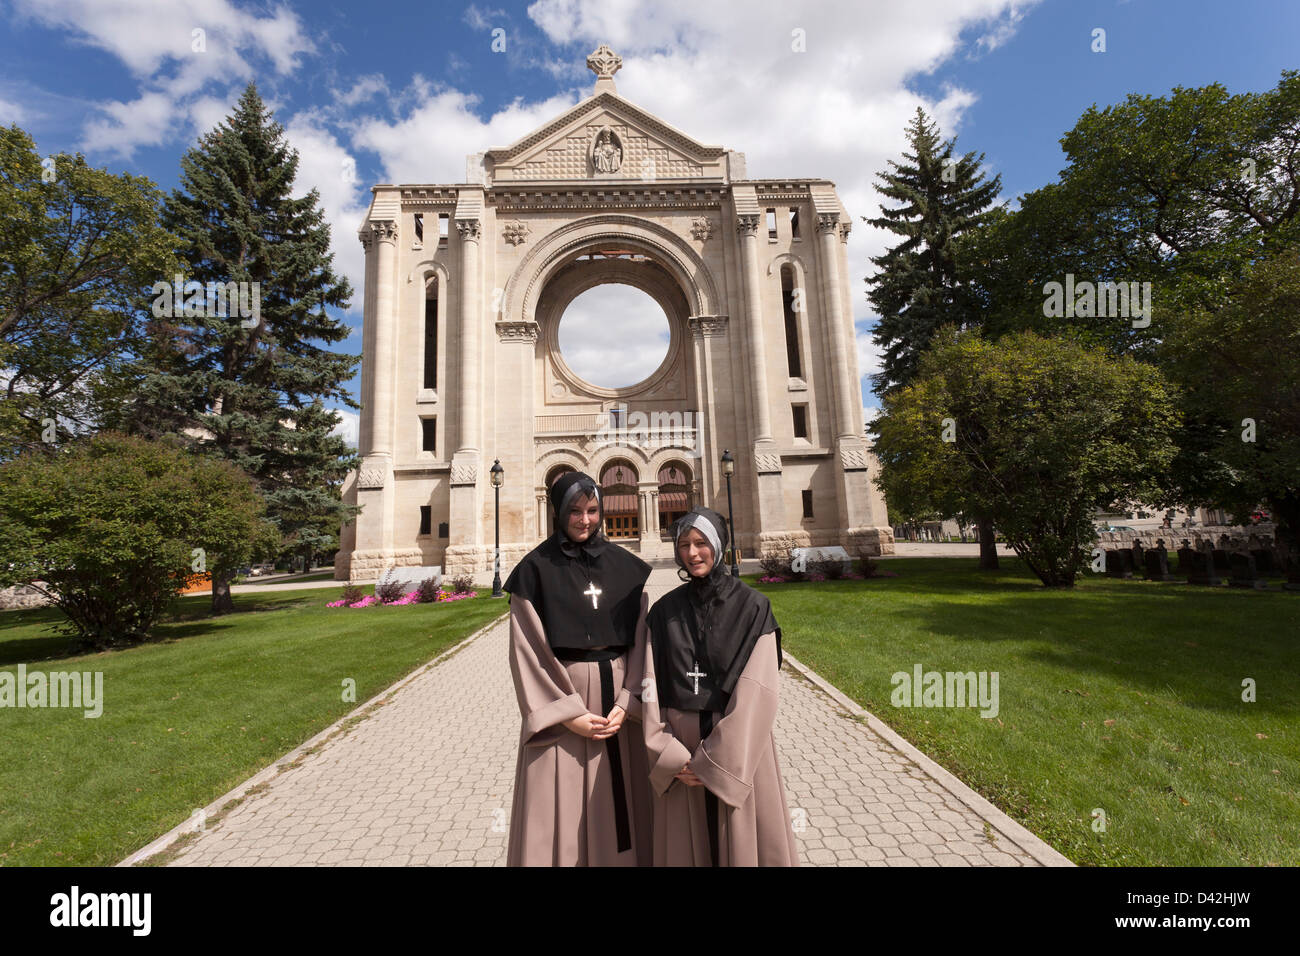 Canada,Manitoba,Winnipeg,Saint Boniface Cathedral, with two re-enactors portraying nuns - Stock Image